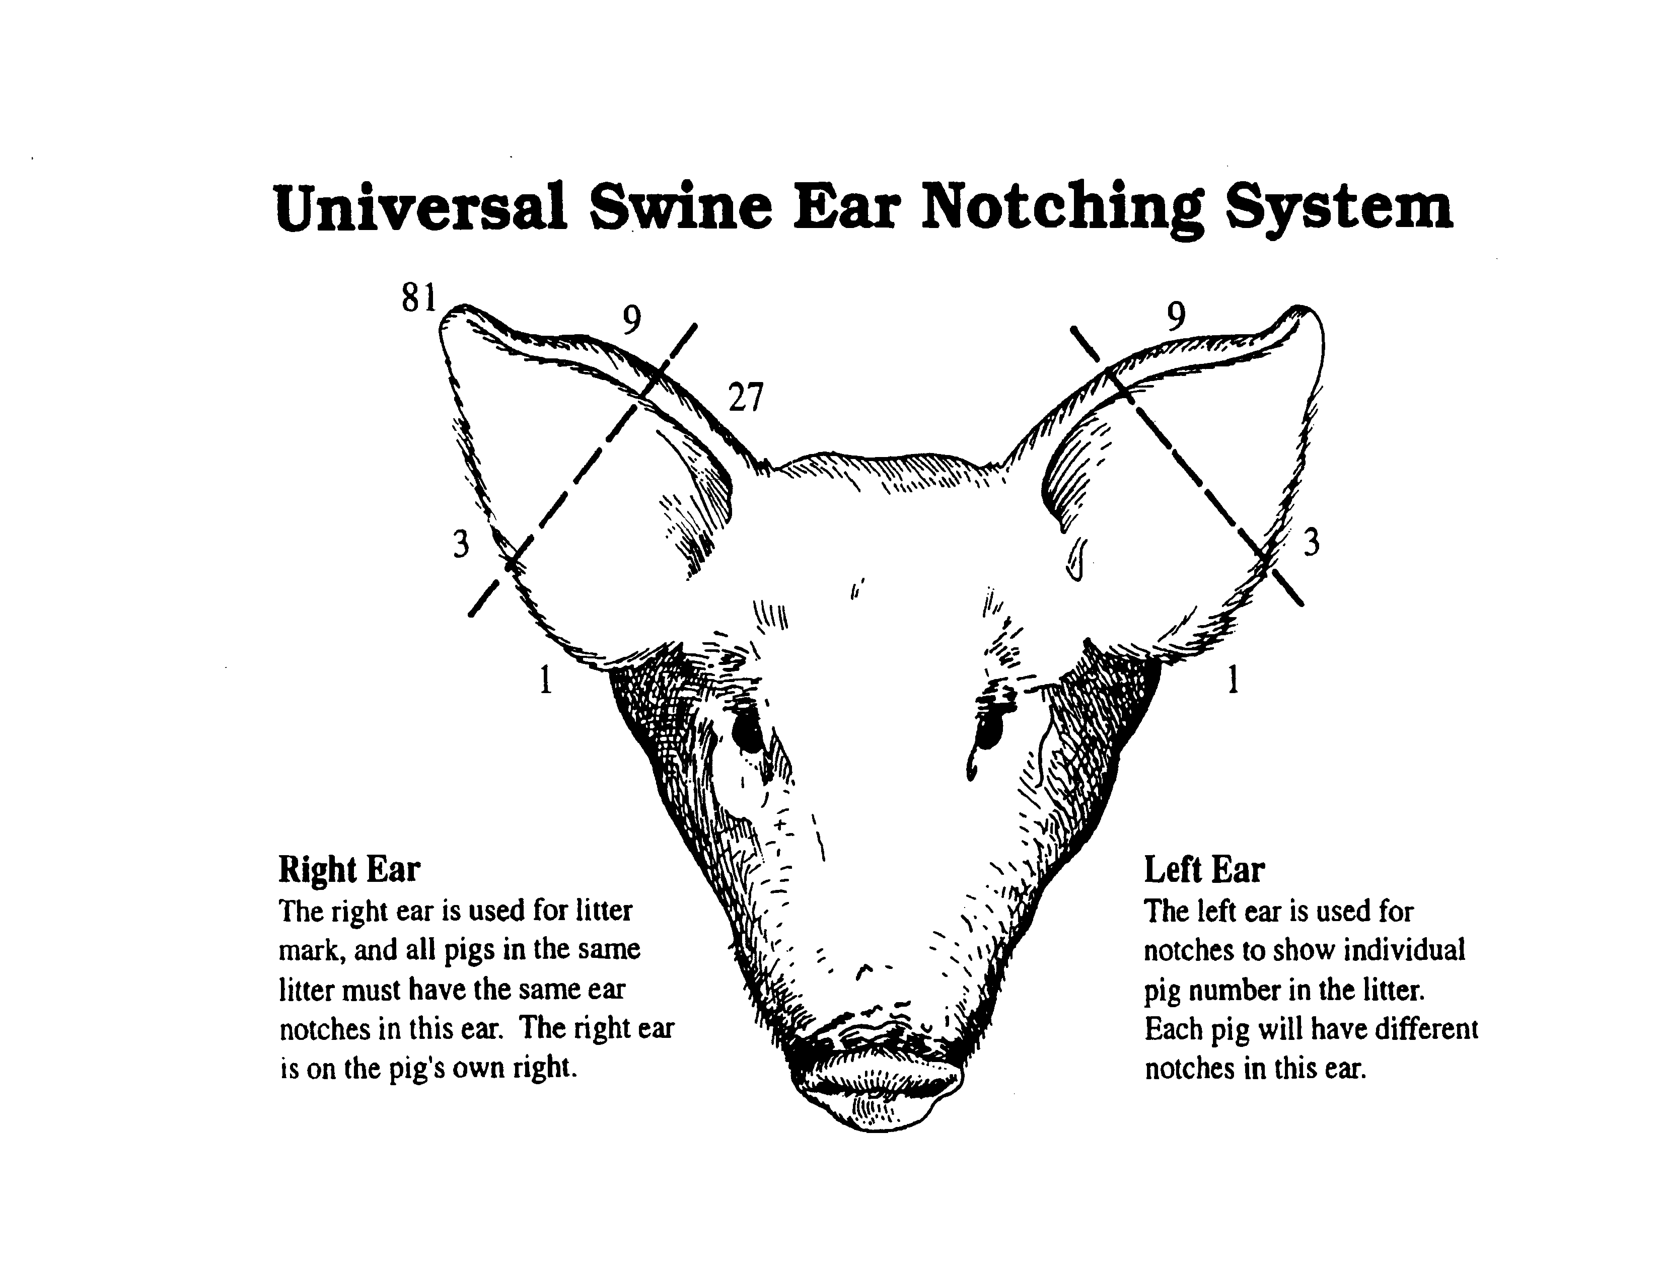 medium resolution of pig ear notches universal swine ear notching system stock show pig skeleton diagram pig ear diagram